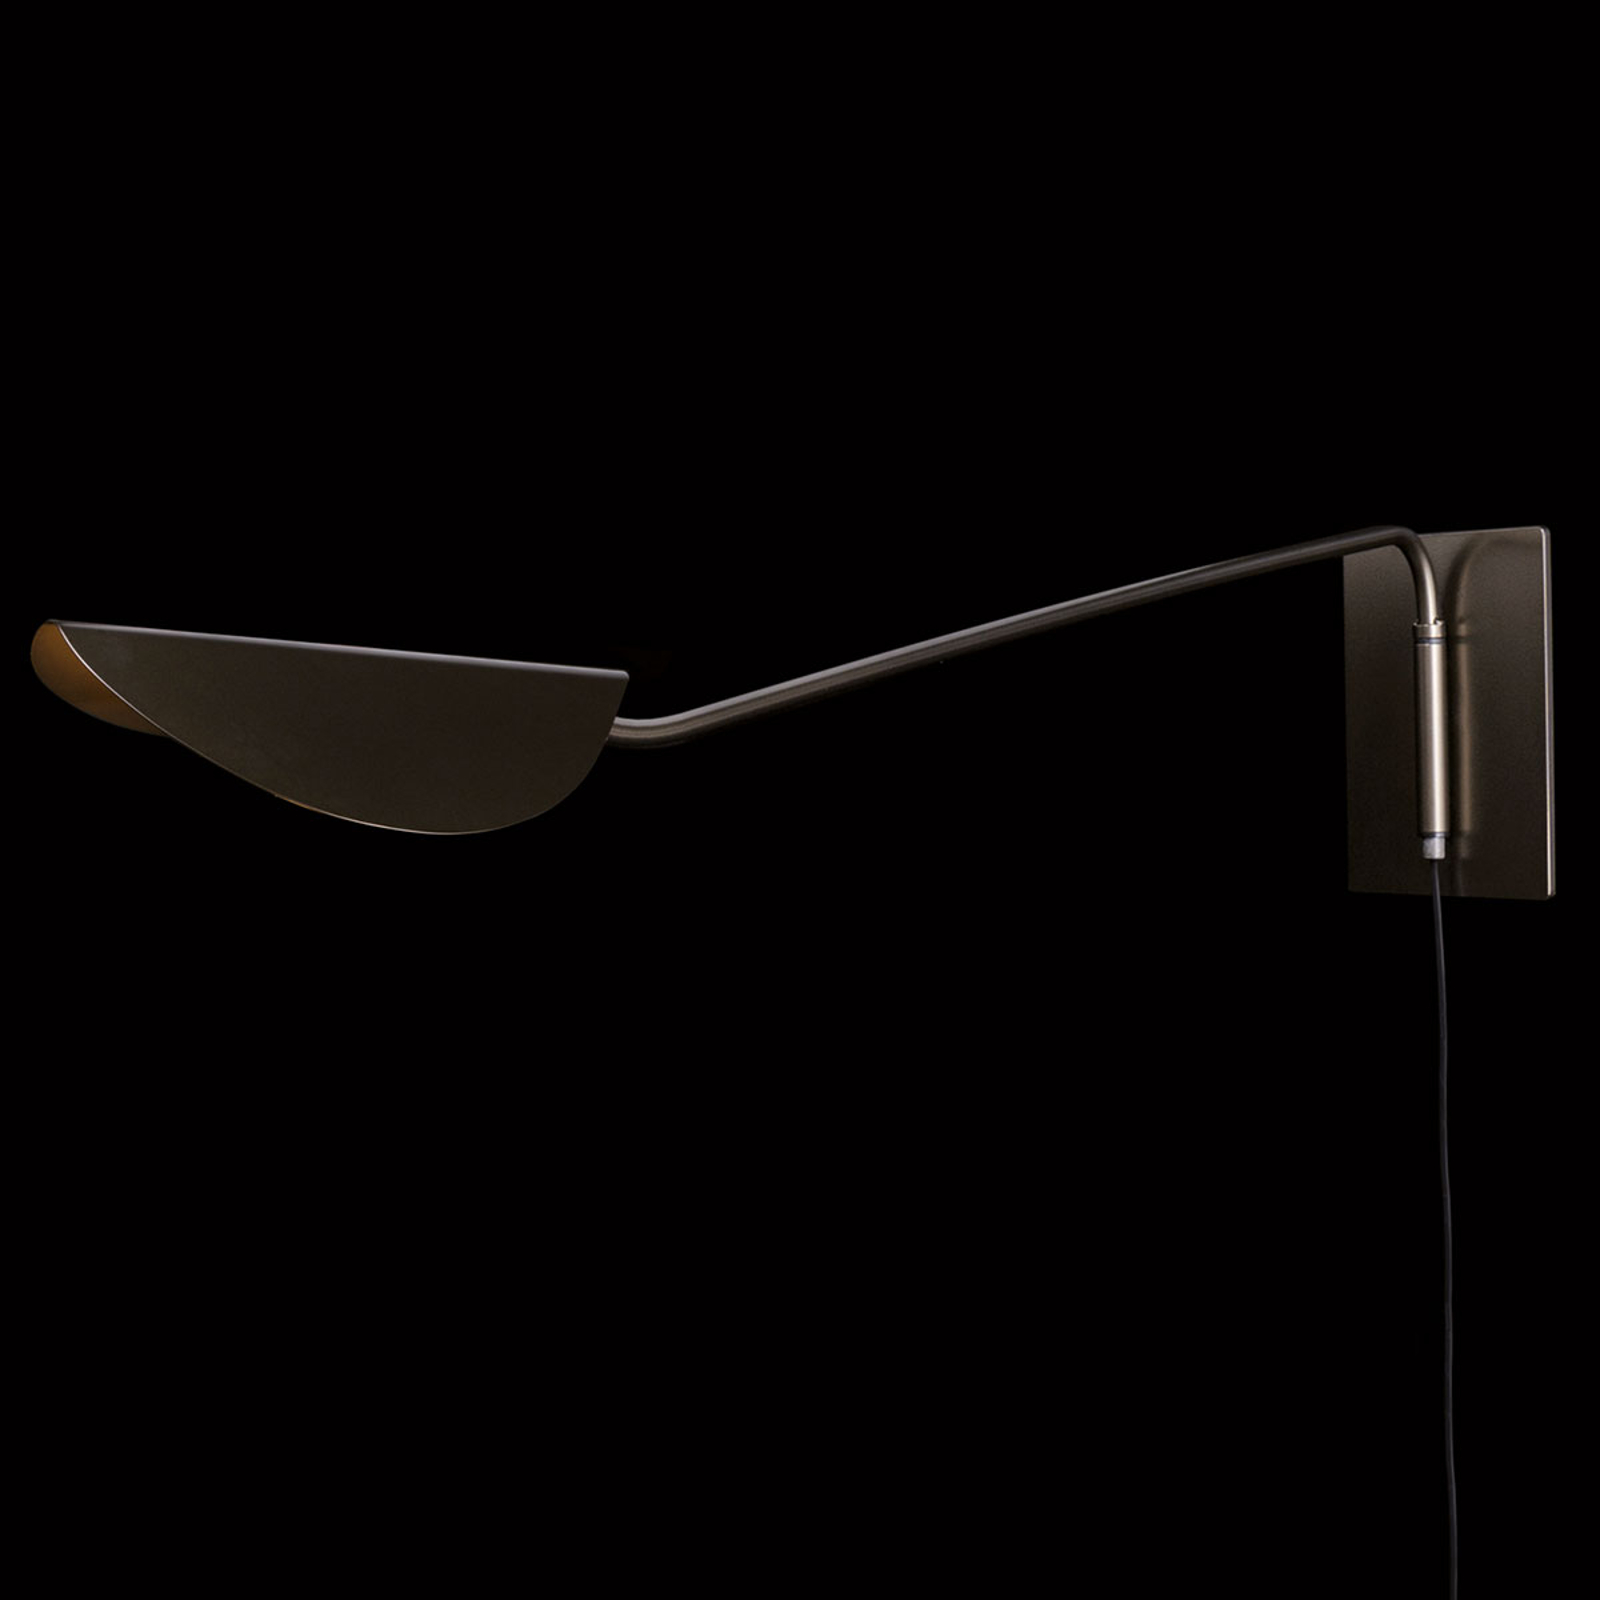 Oluce Plume applique - sporgenza 160 cm